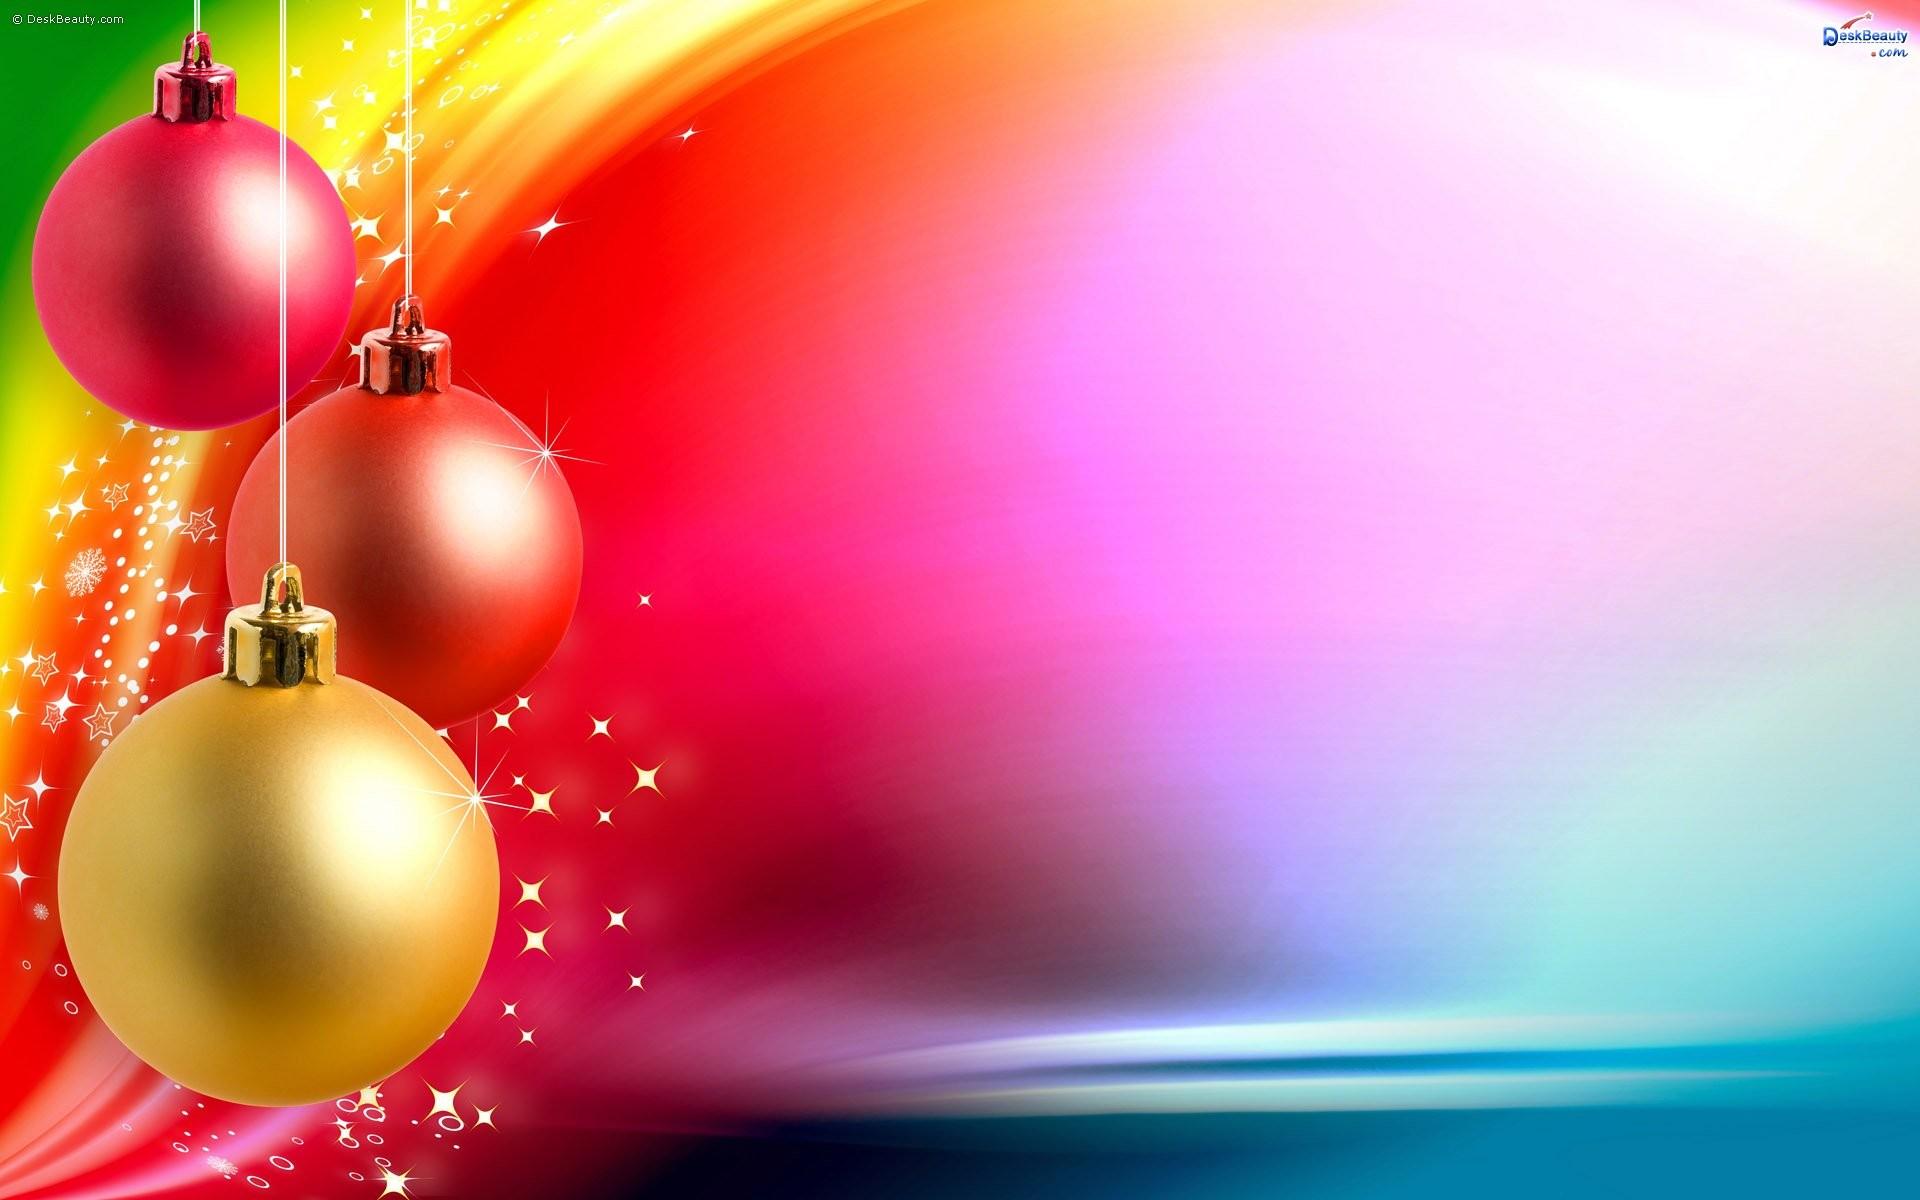 HD Christmas wallpaper ·① Download free cool full HD ...